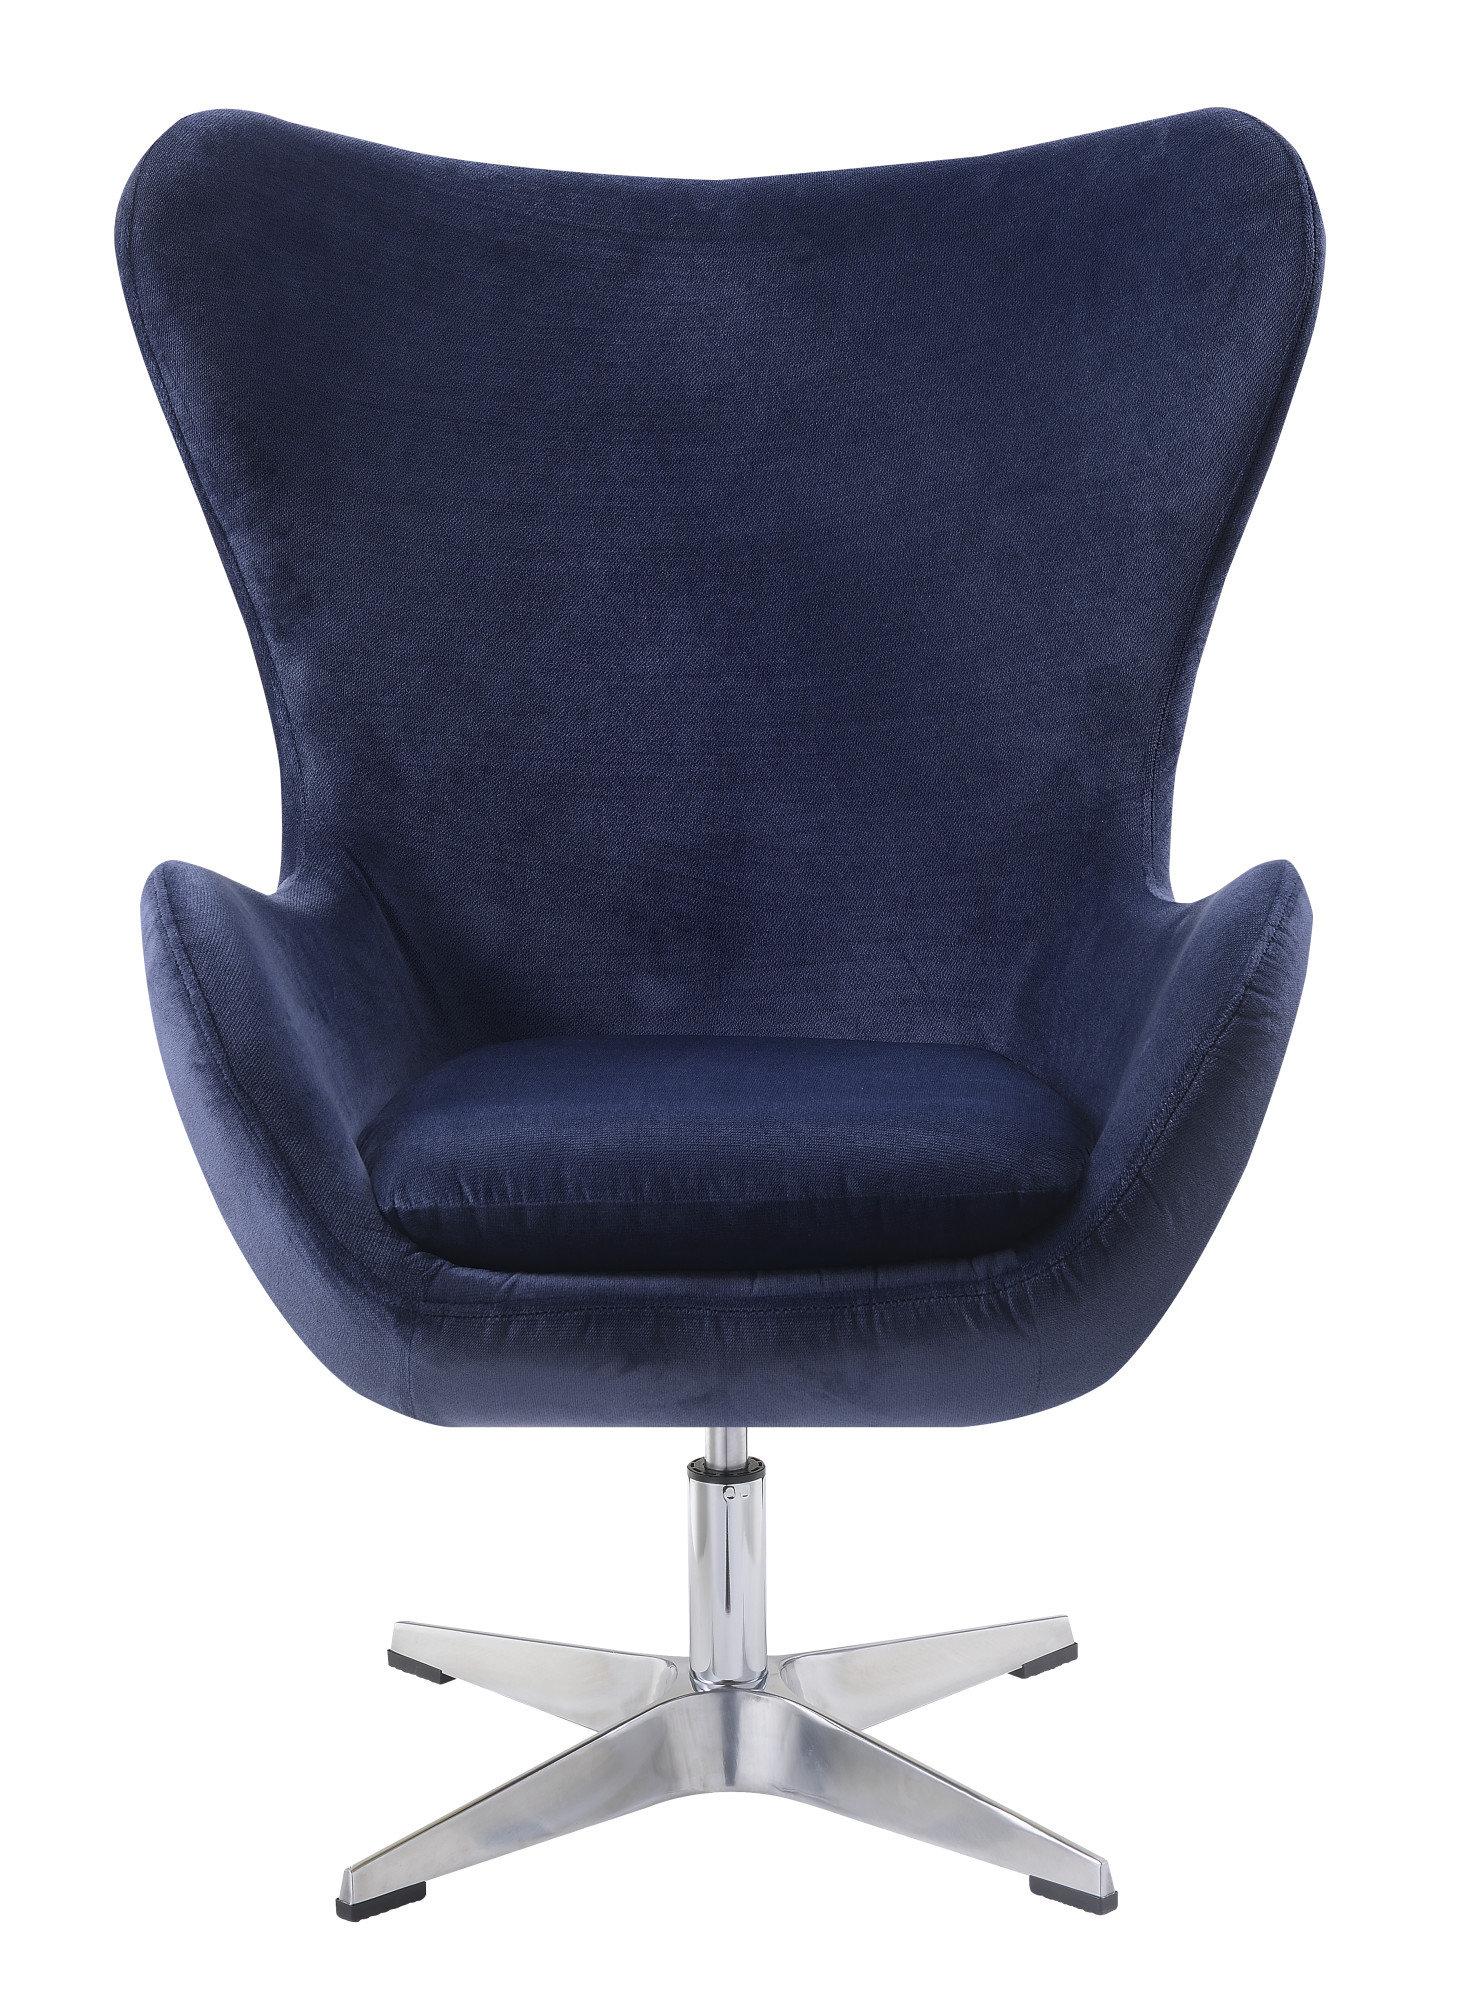 Mercer41 Heid Swivel Wingback Chair | Wayfair